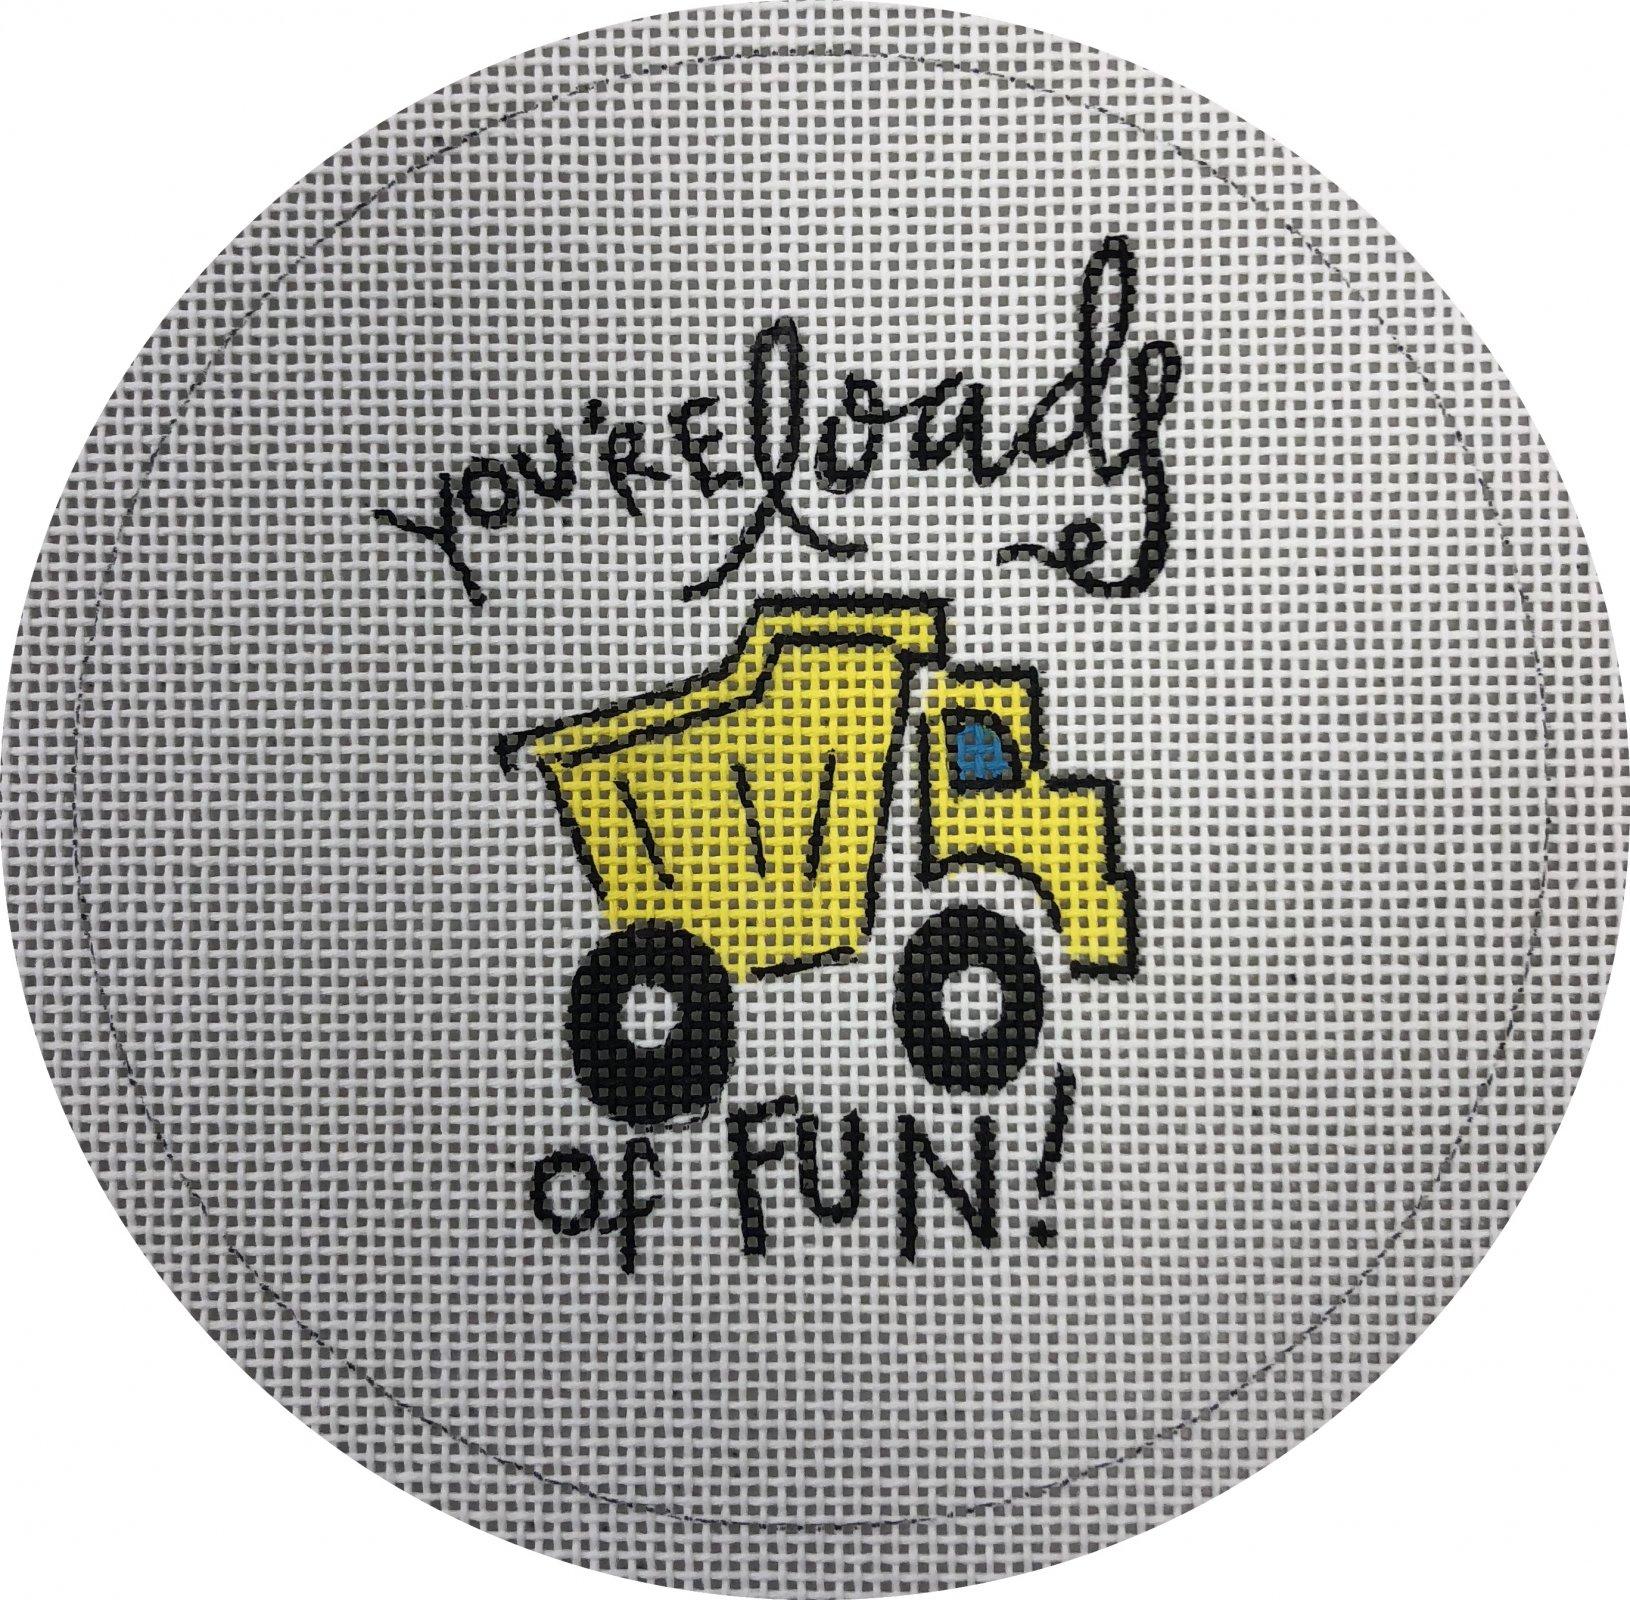 you're loads of fun